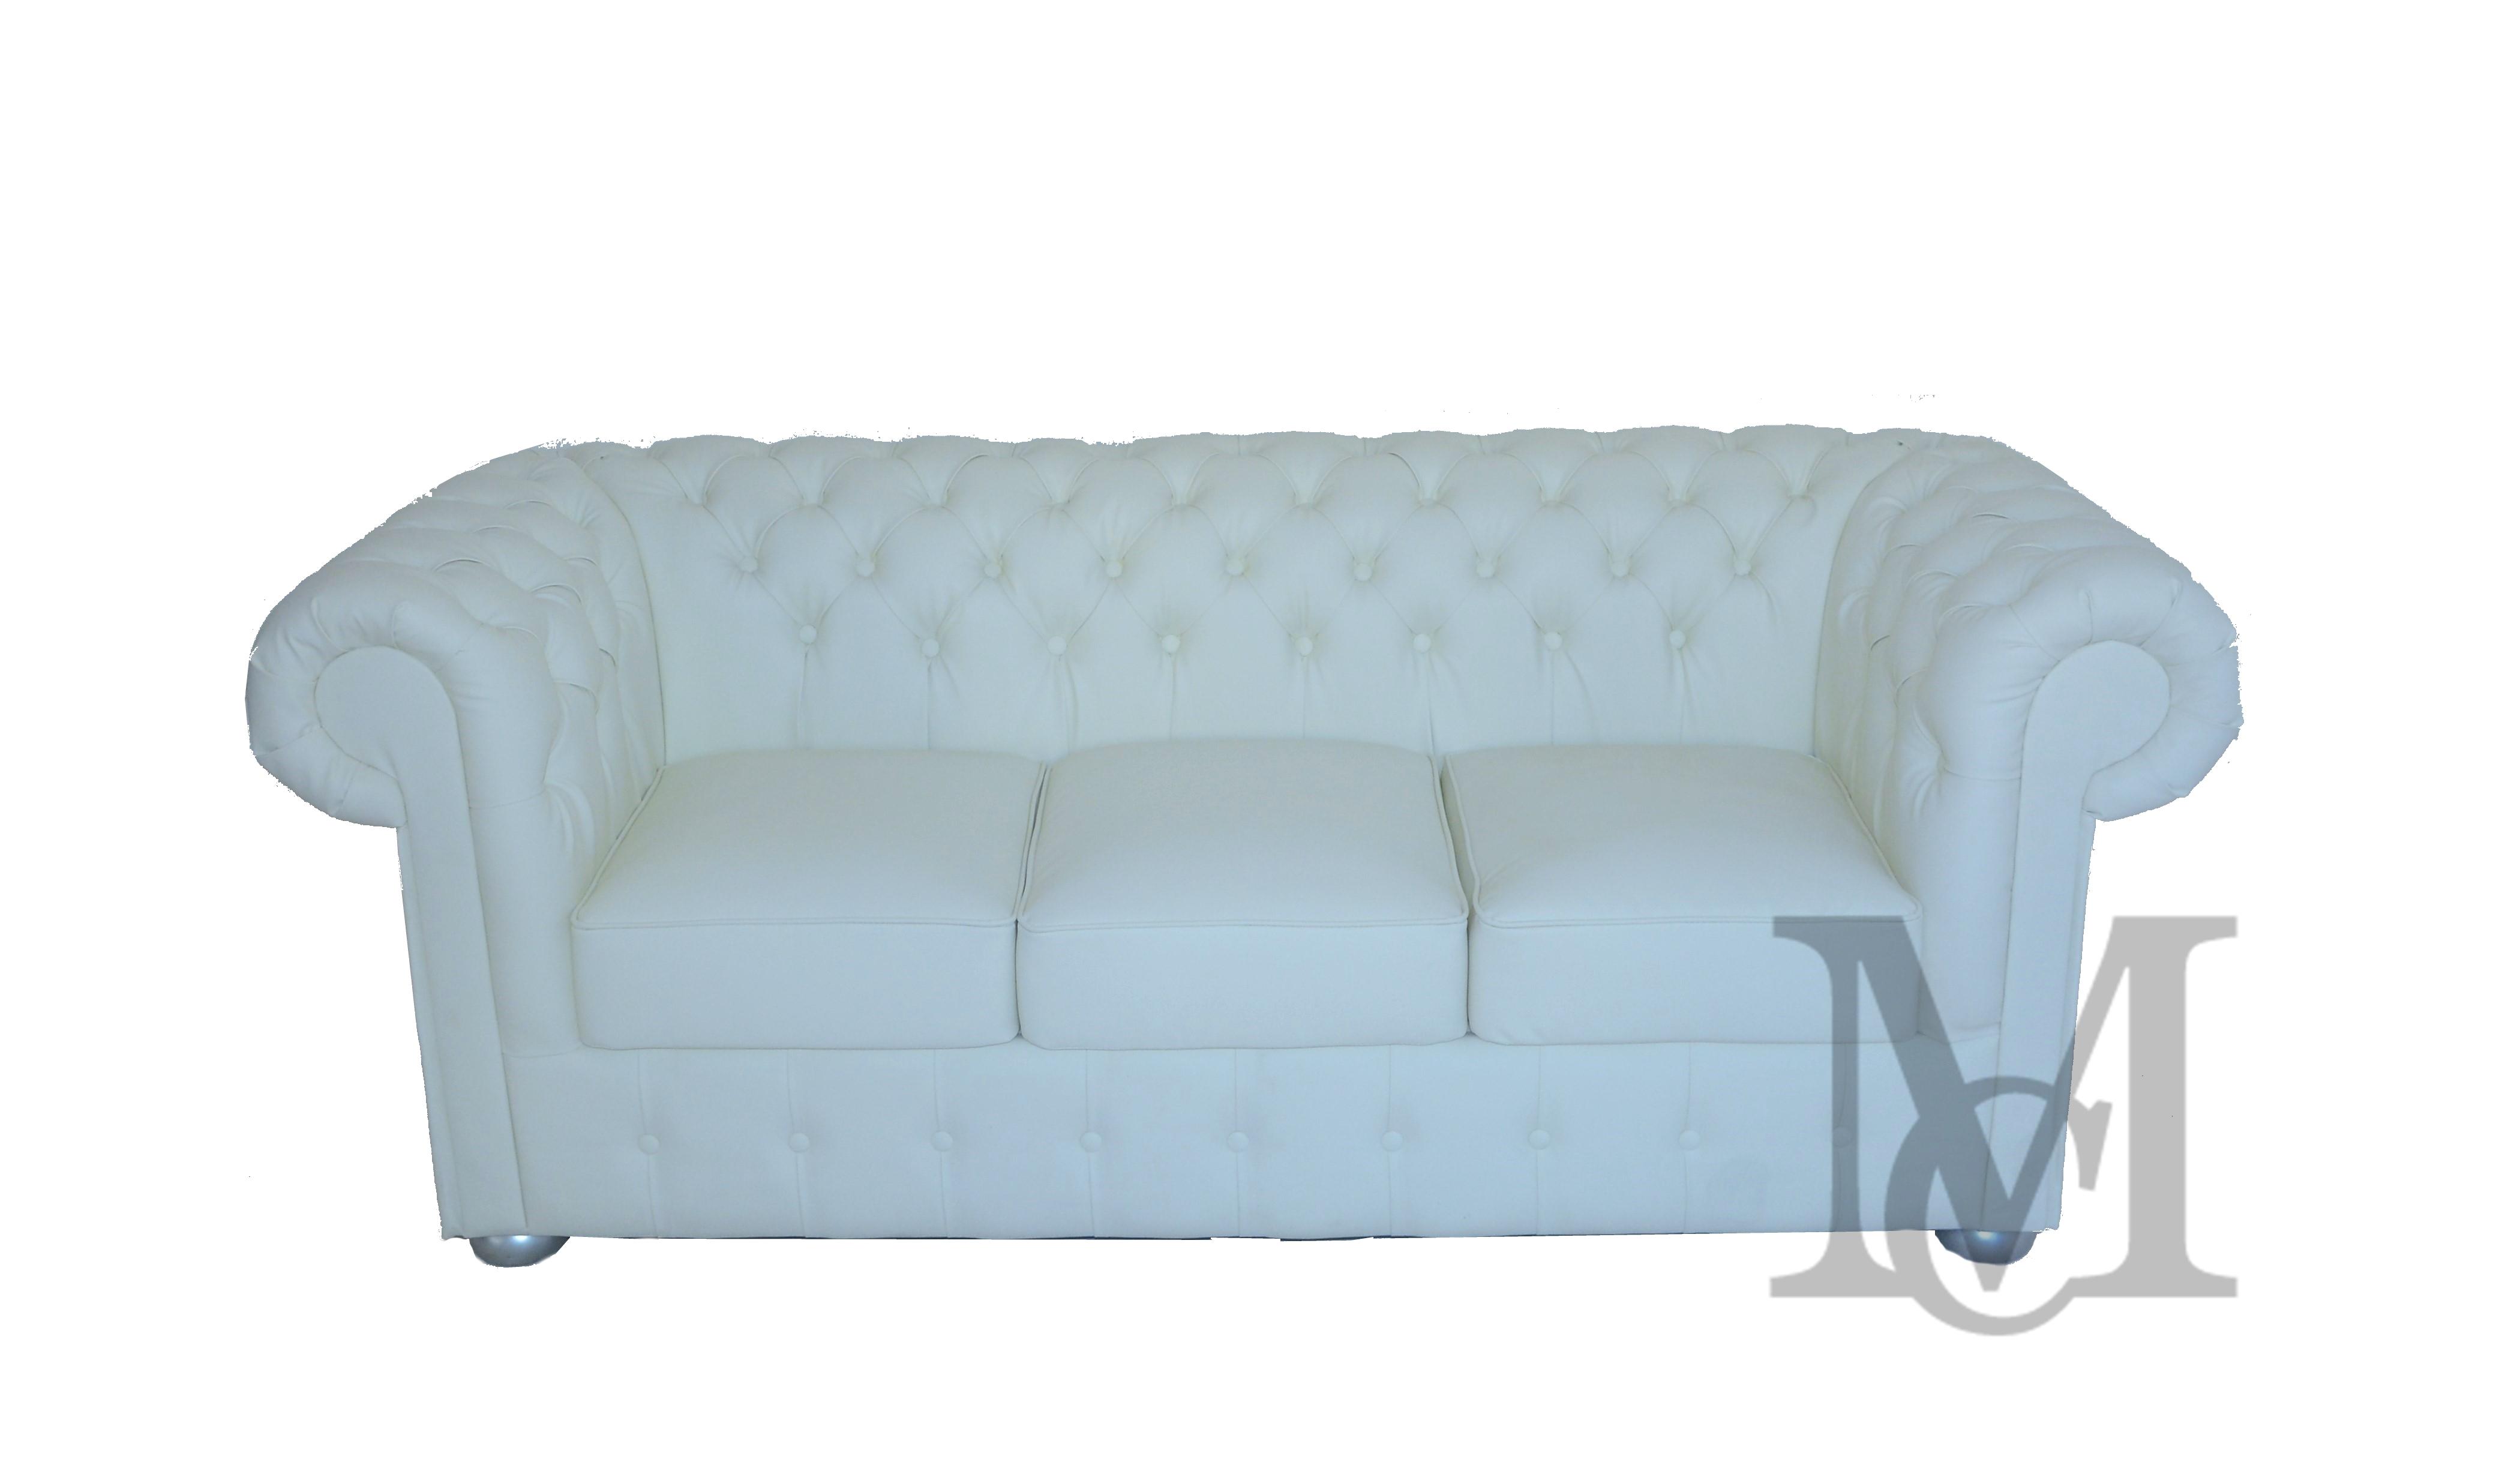 Sofa Classic Chesterfield 3 Osobowa Pluszowa Pikowana Kanapa